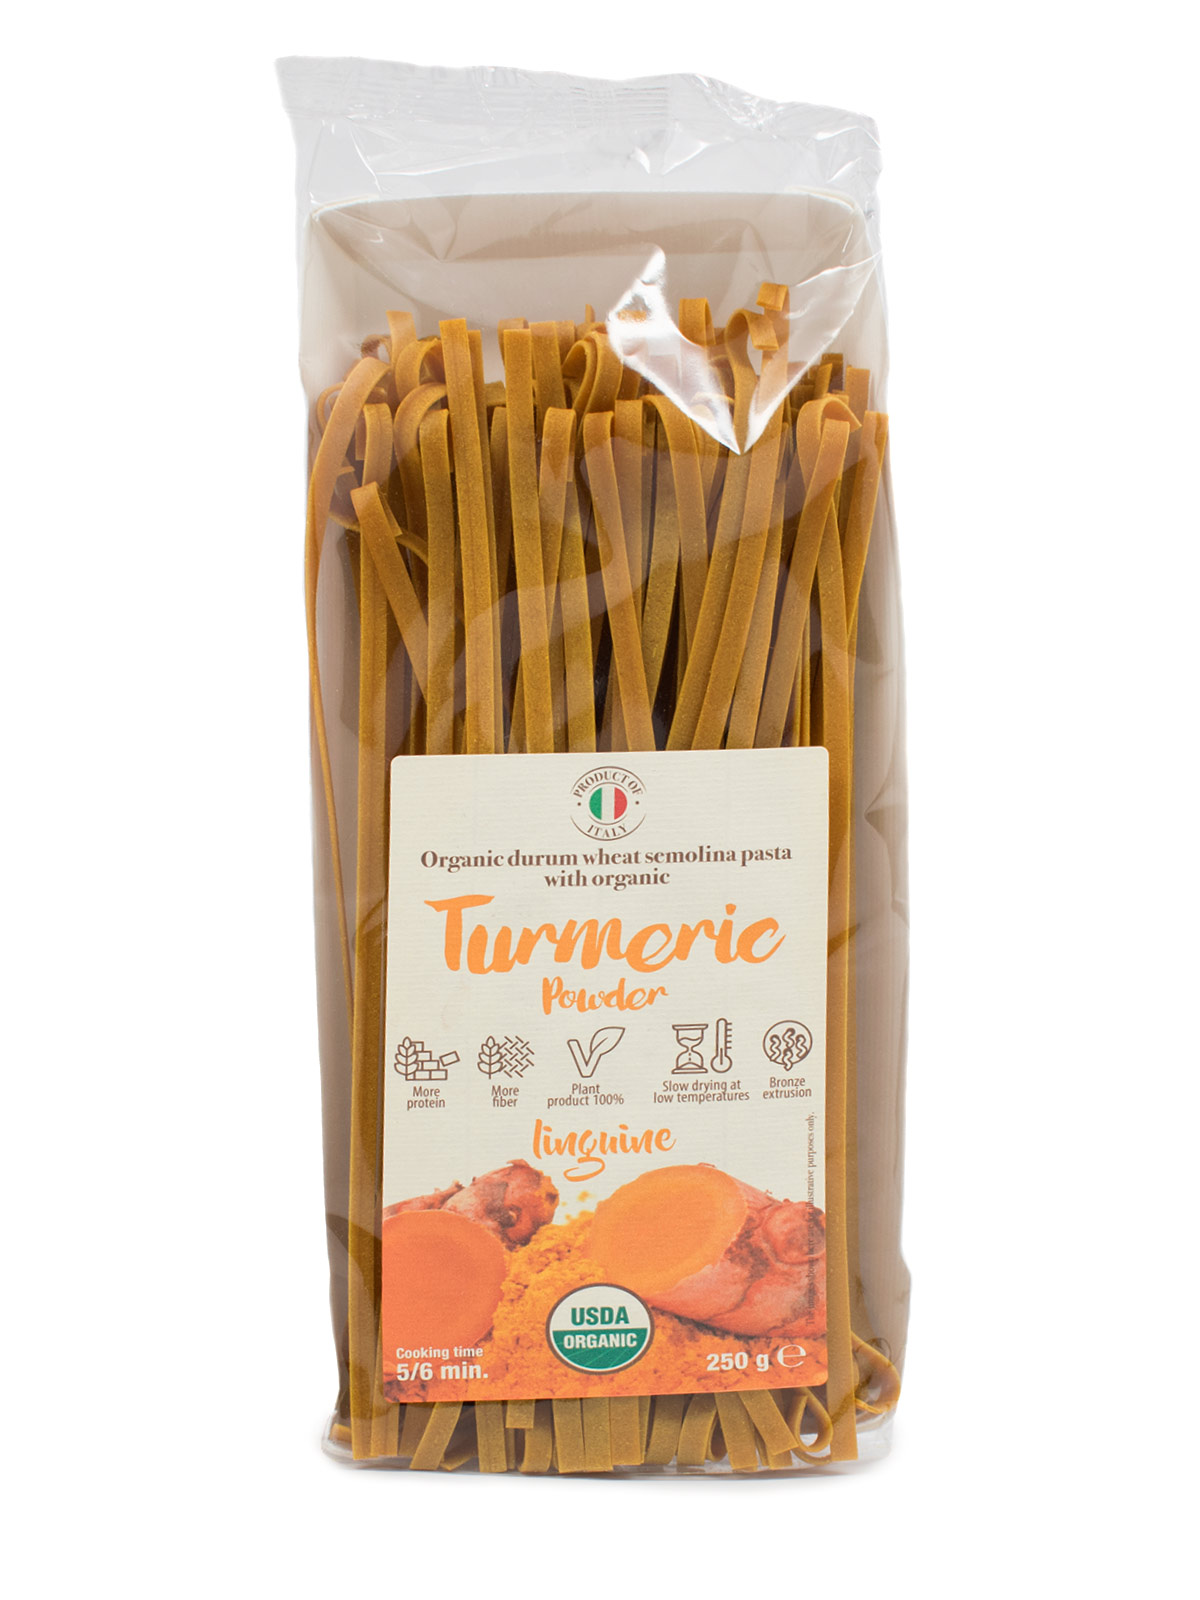 Linguine with Organic Turmeric Flour - Pastas, Rice, and Grains - Buon'Italia